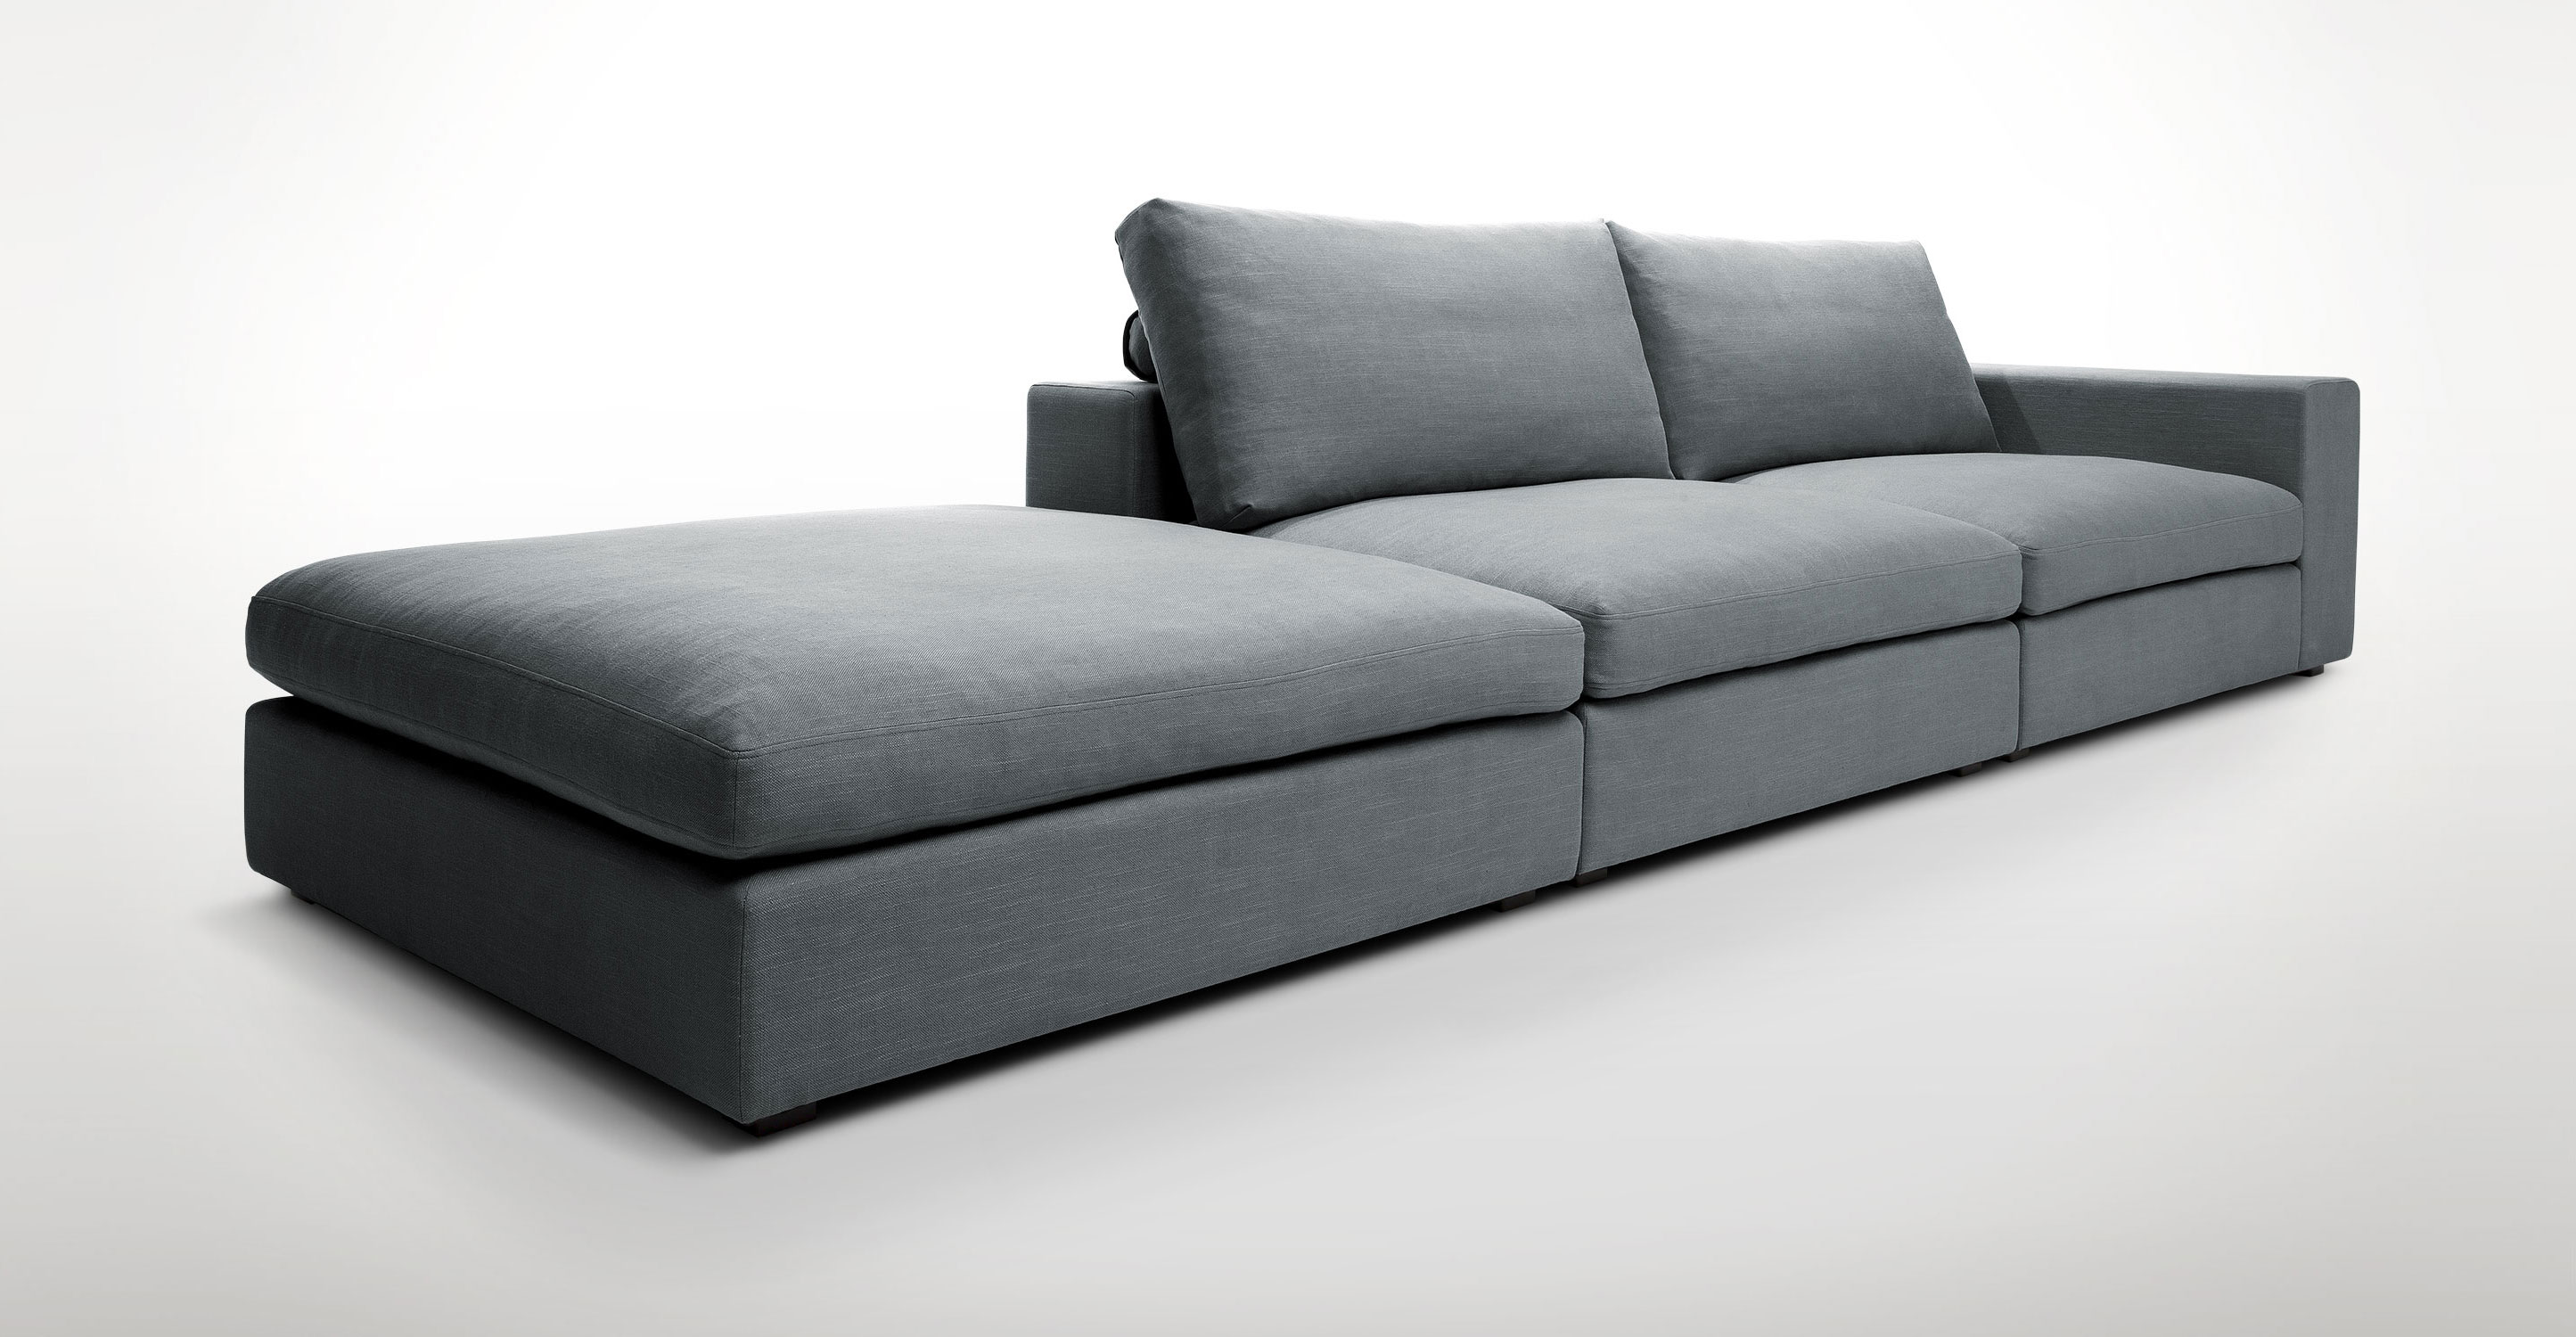 Cube modular sofa according to article XVJNASN